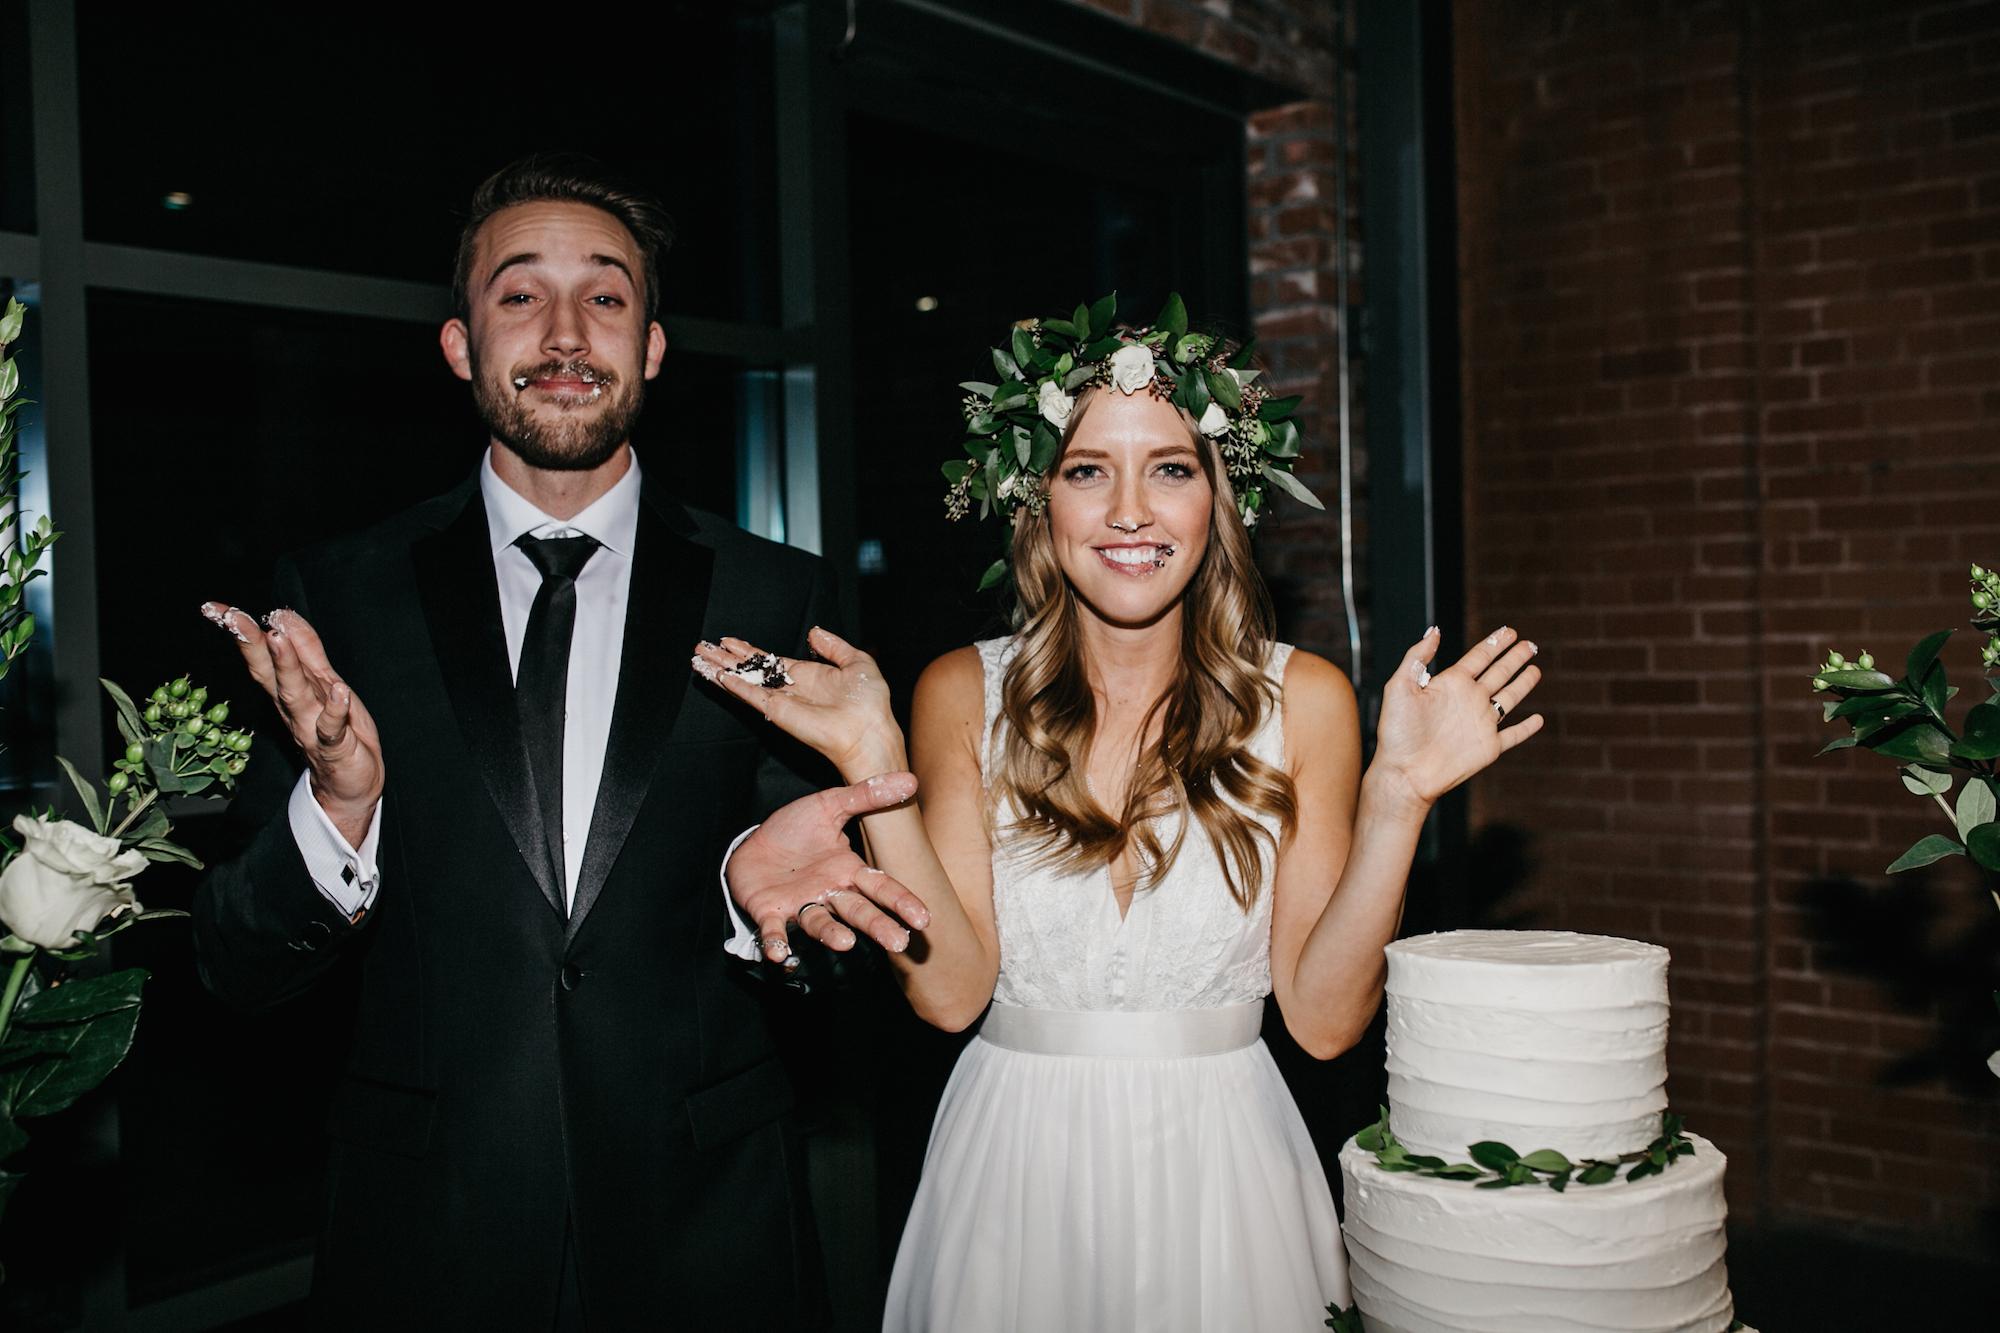 arizona - wedding - photographer 661.jpg